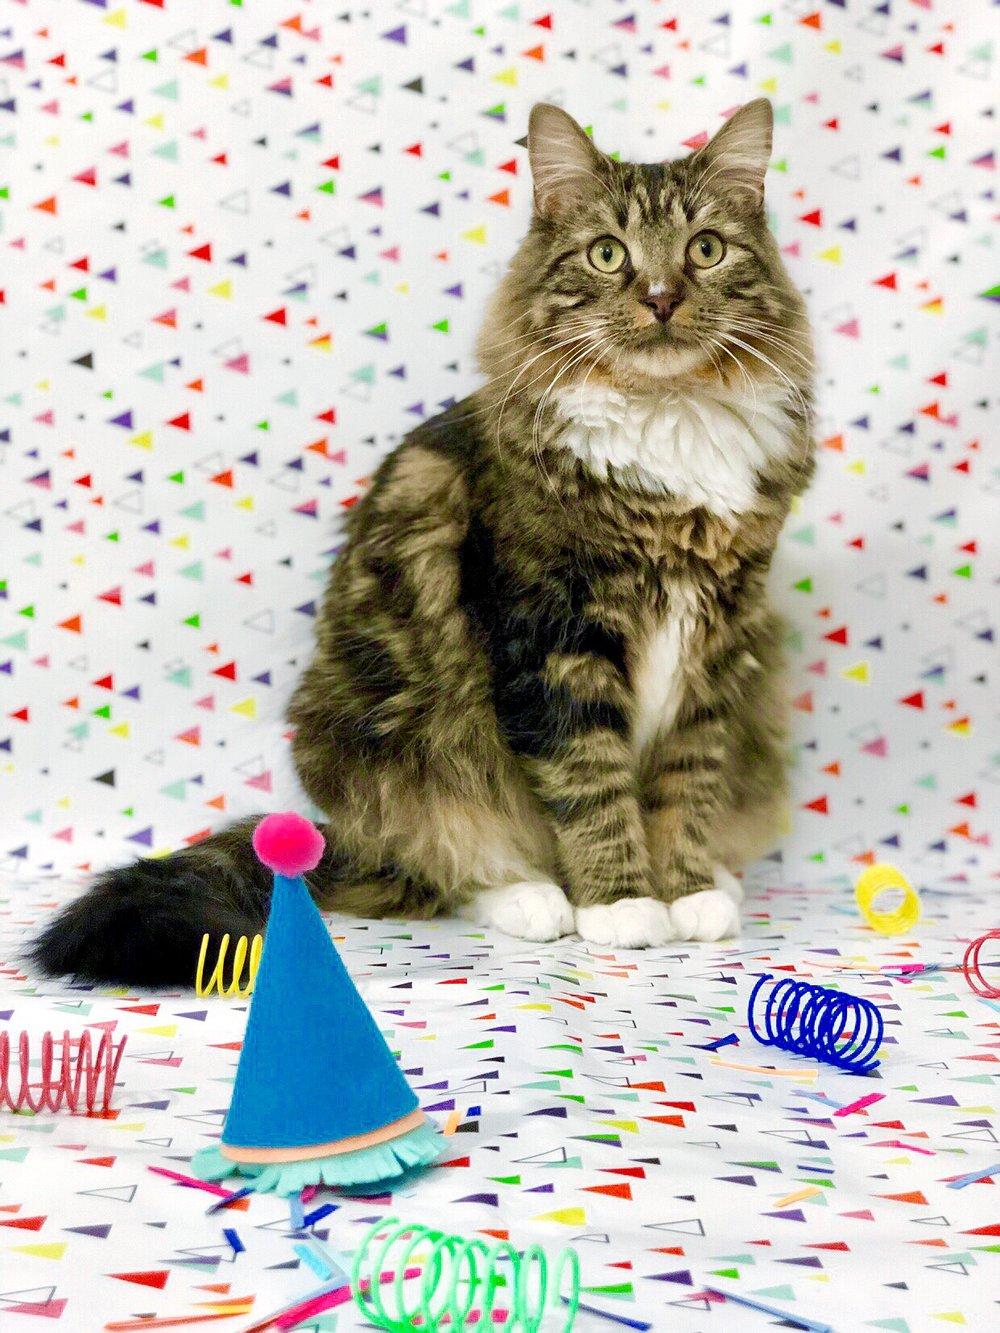 Easy Cat Birthday Party Hat DIY #catDIY #catsofinstagram #catlady #catlover #catbirthday #catcraft #catdaddy #catdad #gaybloggers #petparty #petdiy #catDIY #feltcraft